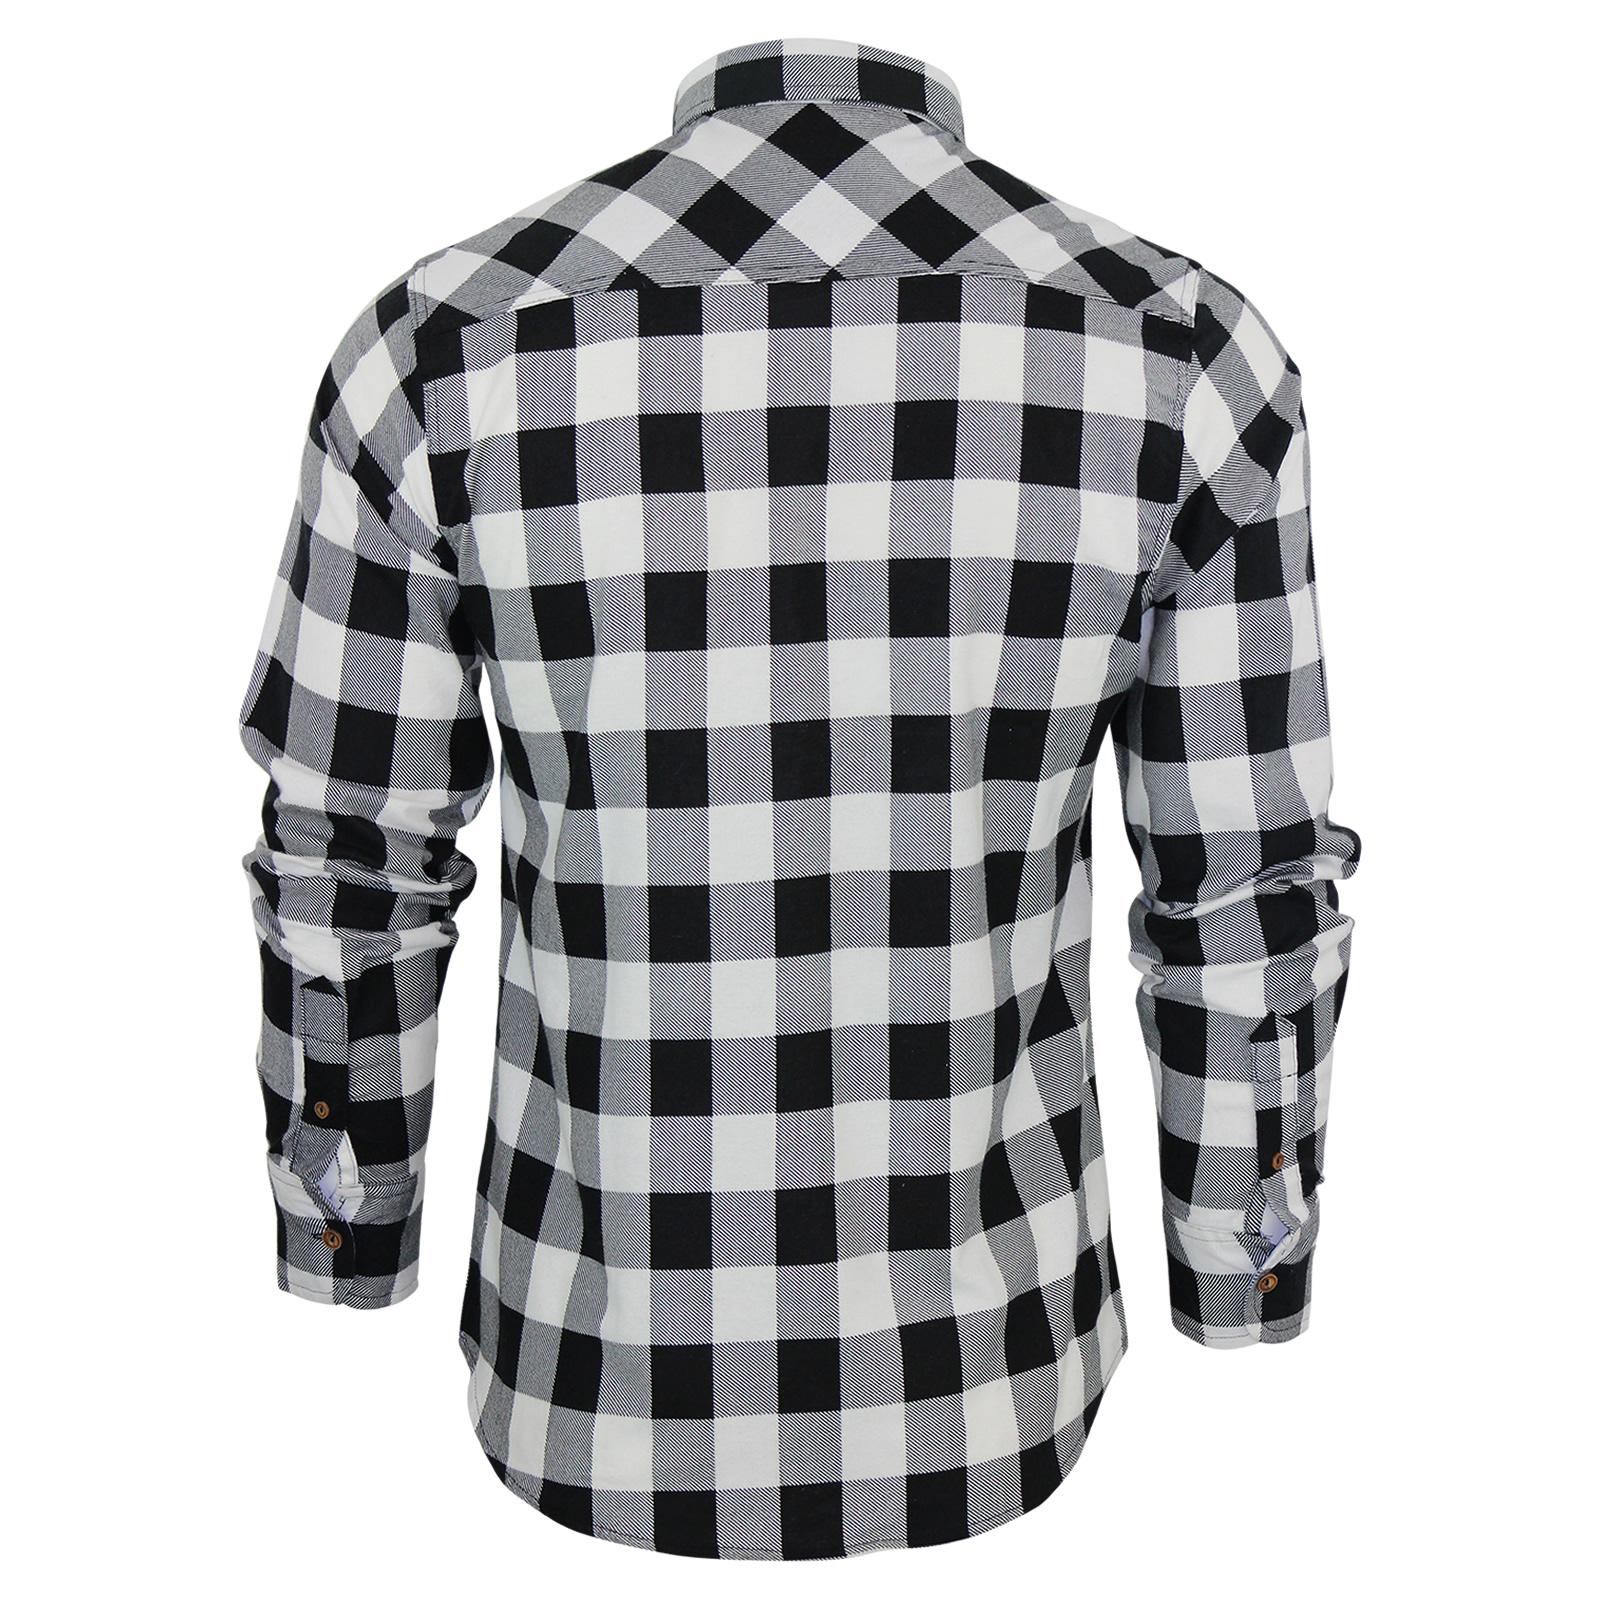 Mens Check Shirt Brave Soul Jack Flannel Brushed Cotton Long ...